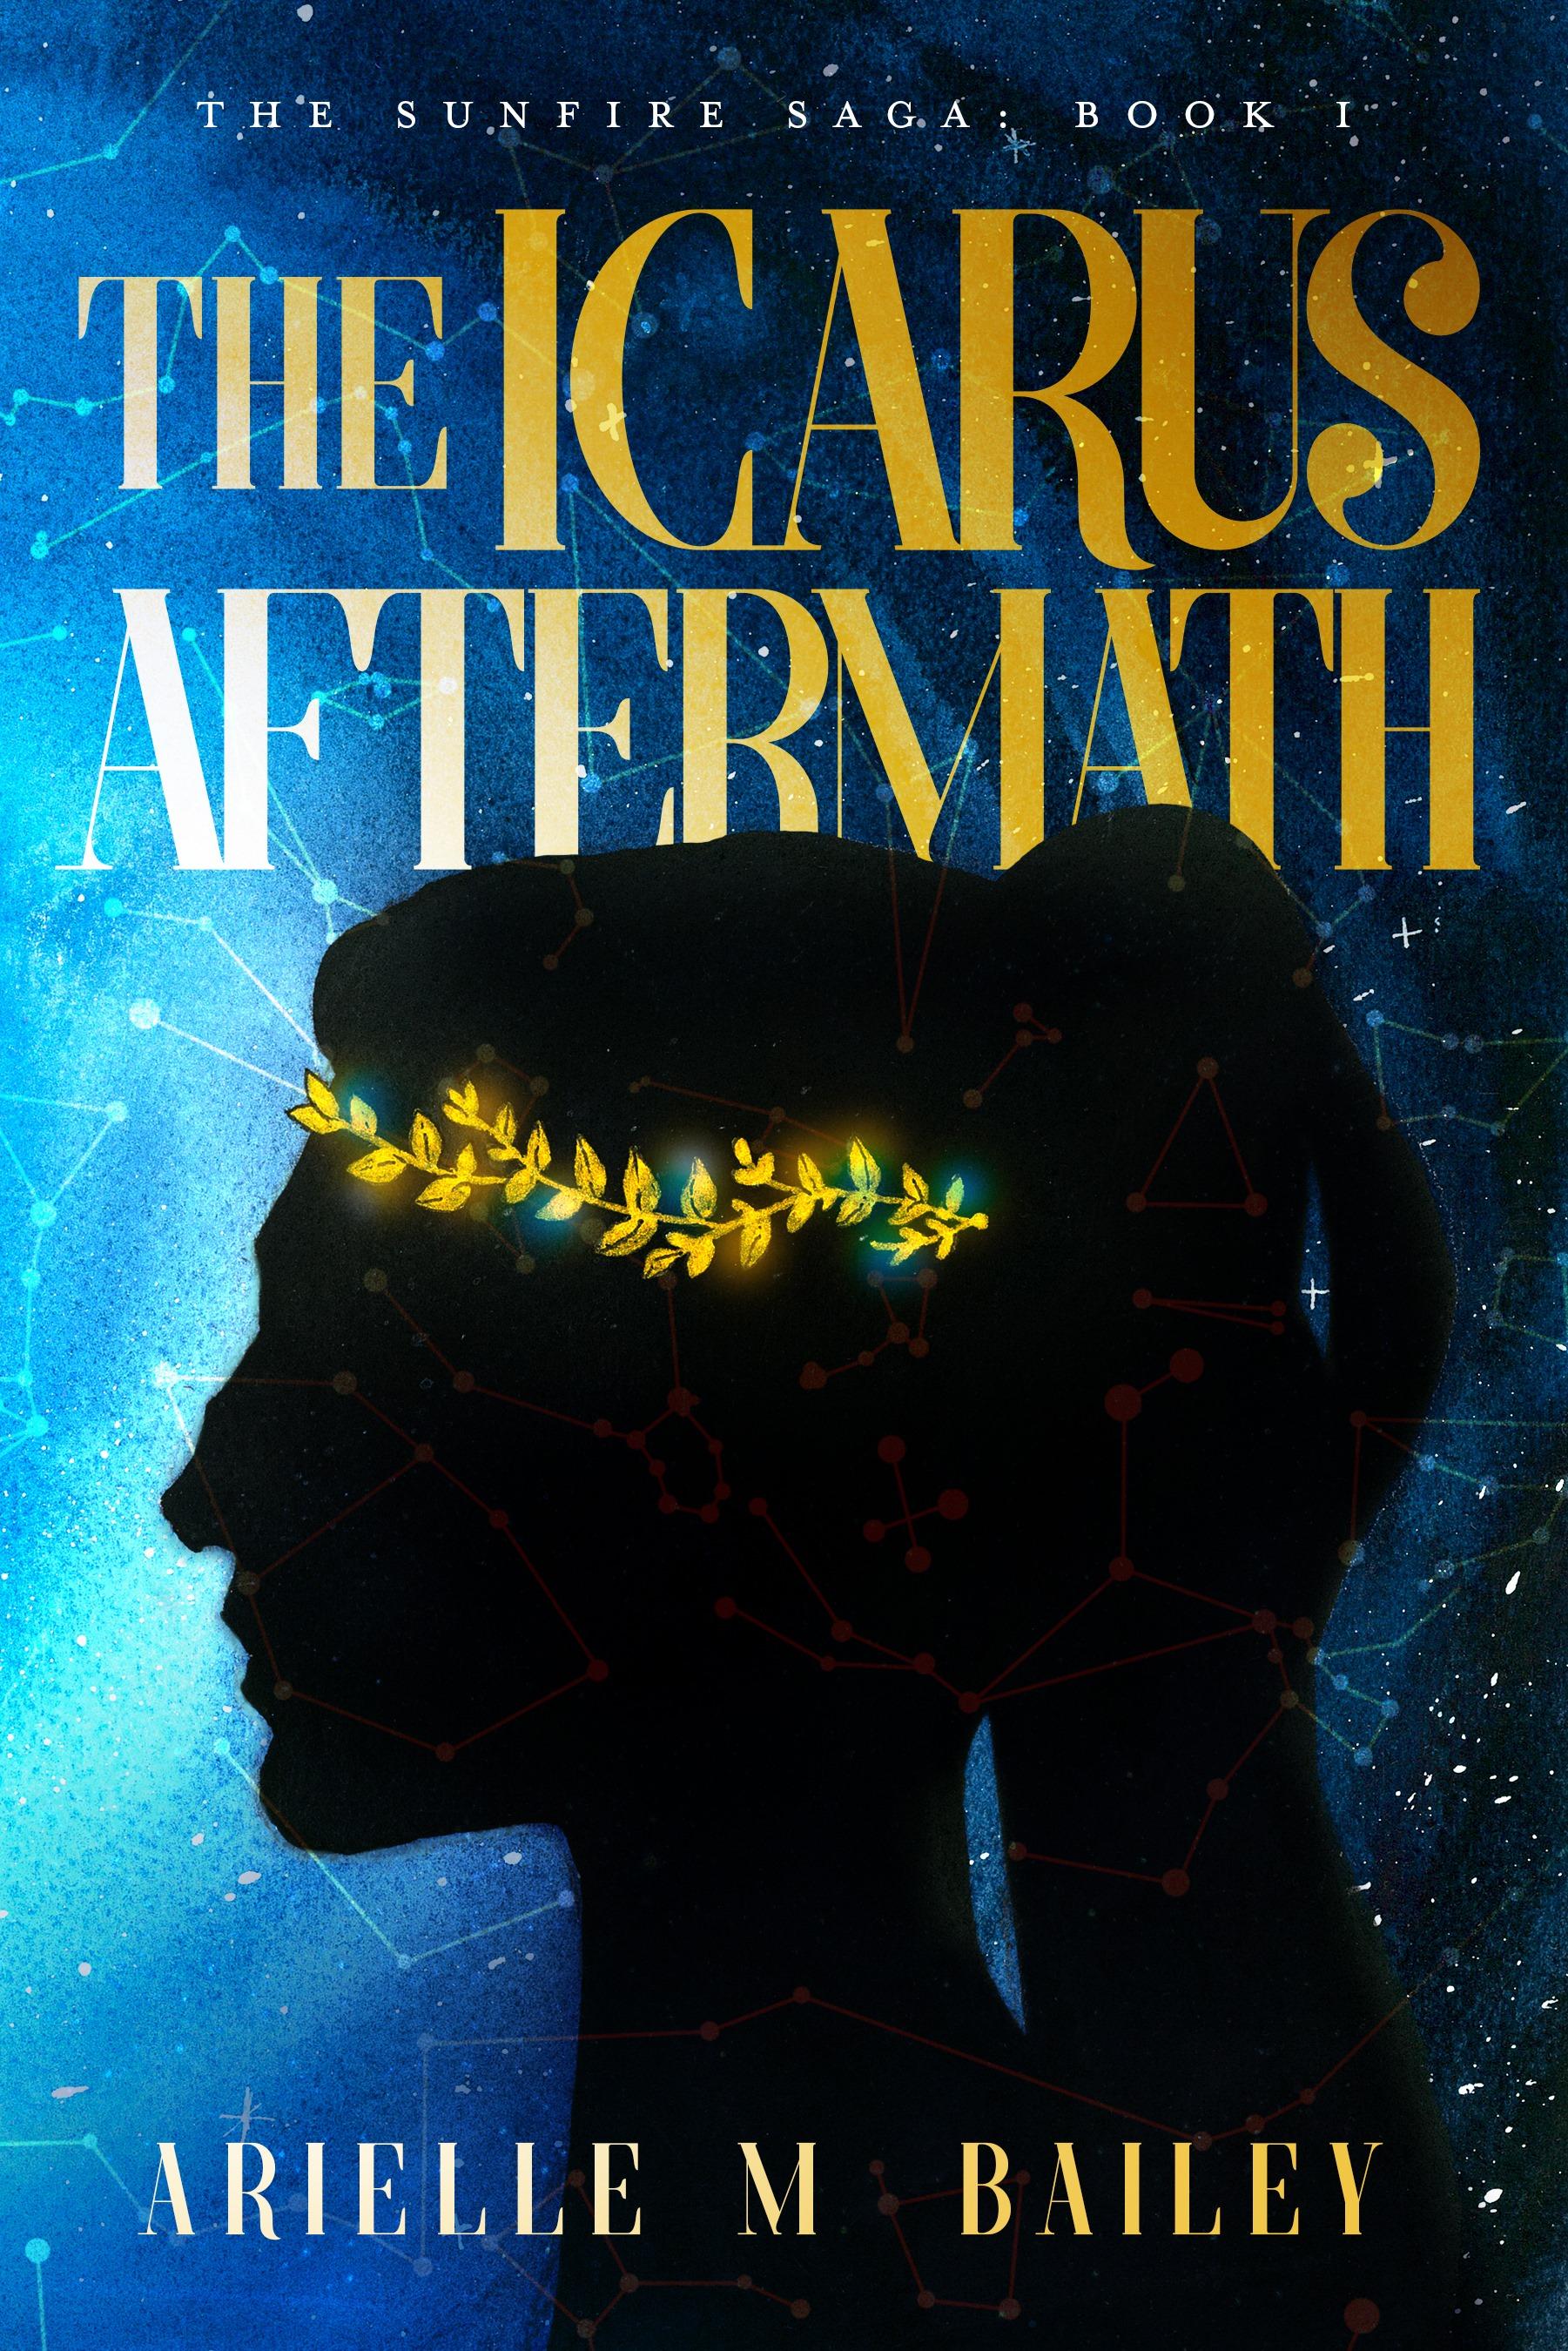 The Icarus Aftermath (The Sunfire Saga, #1)